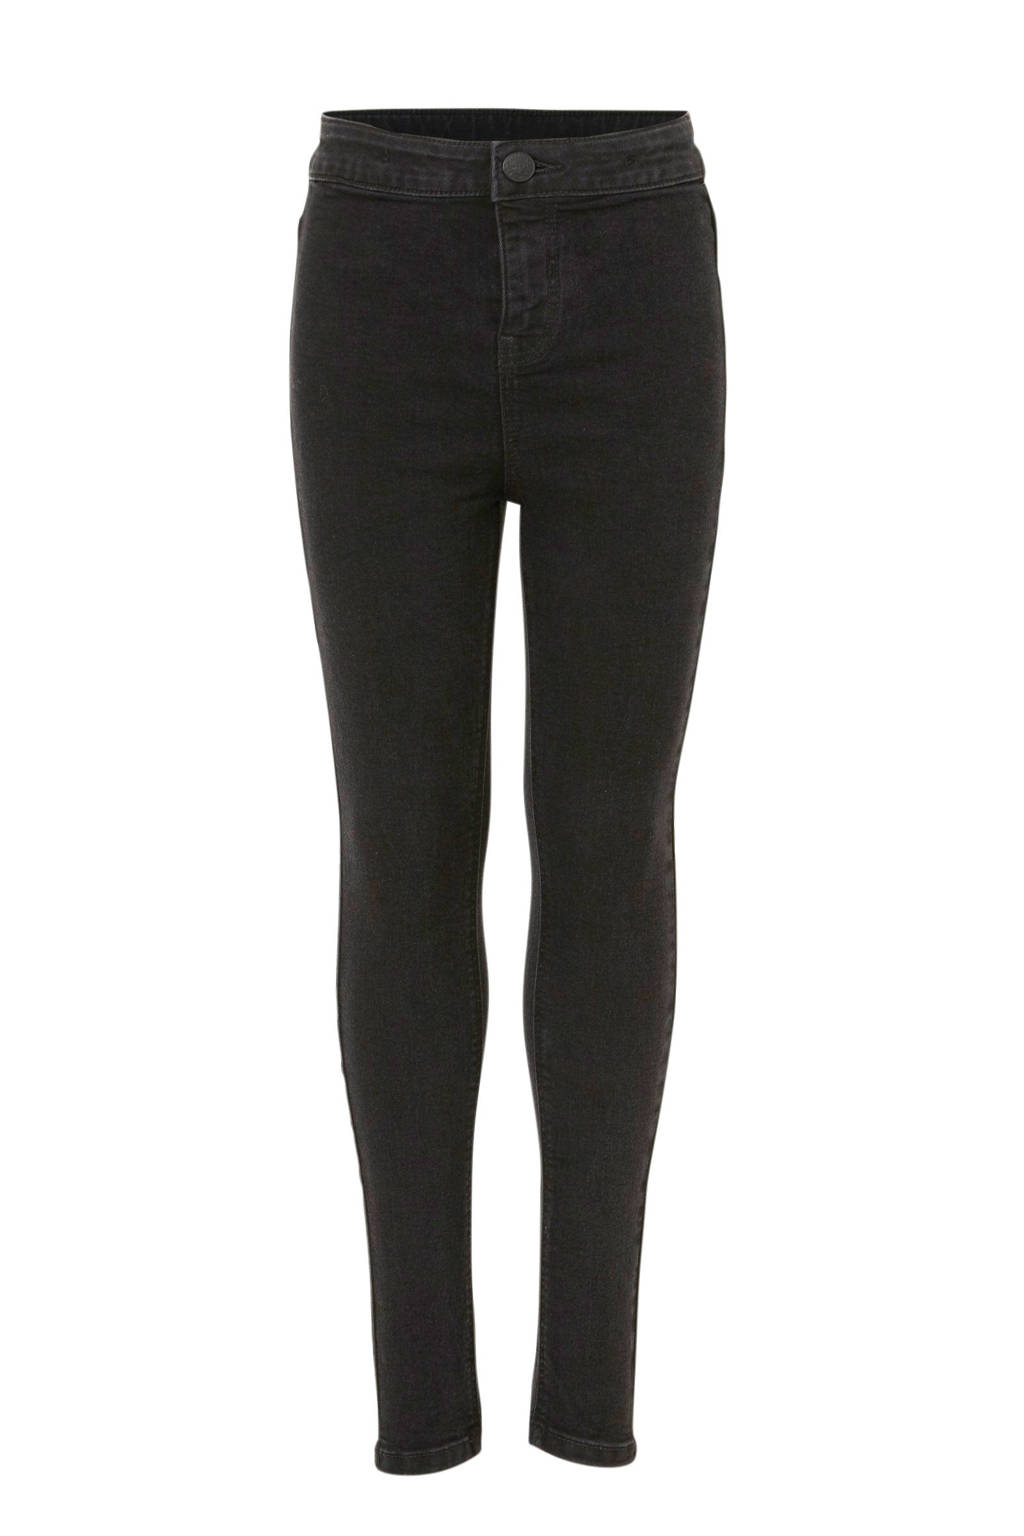 C&A Here & There super skinny jeans zwart, Zwart